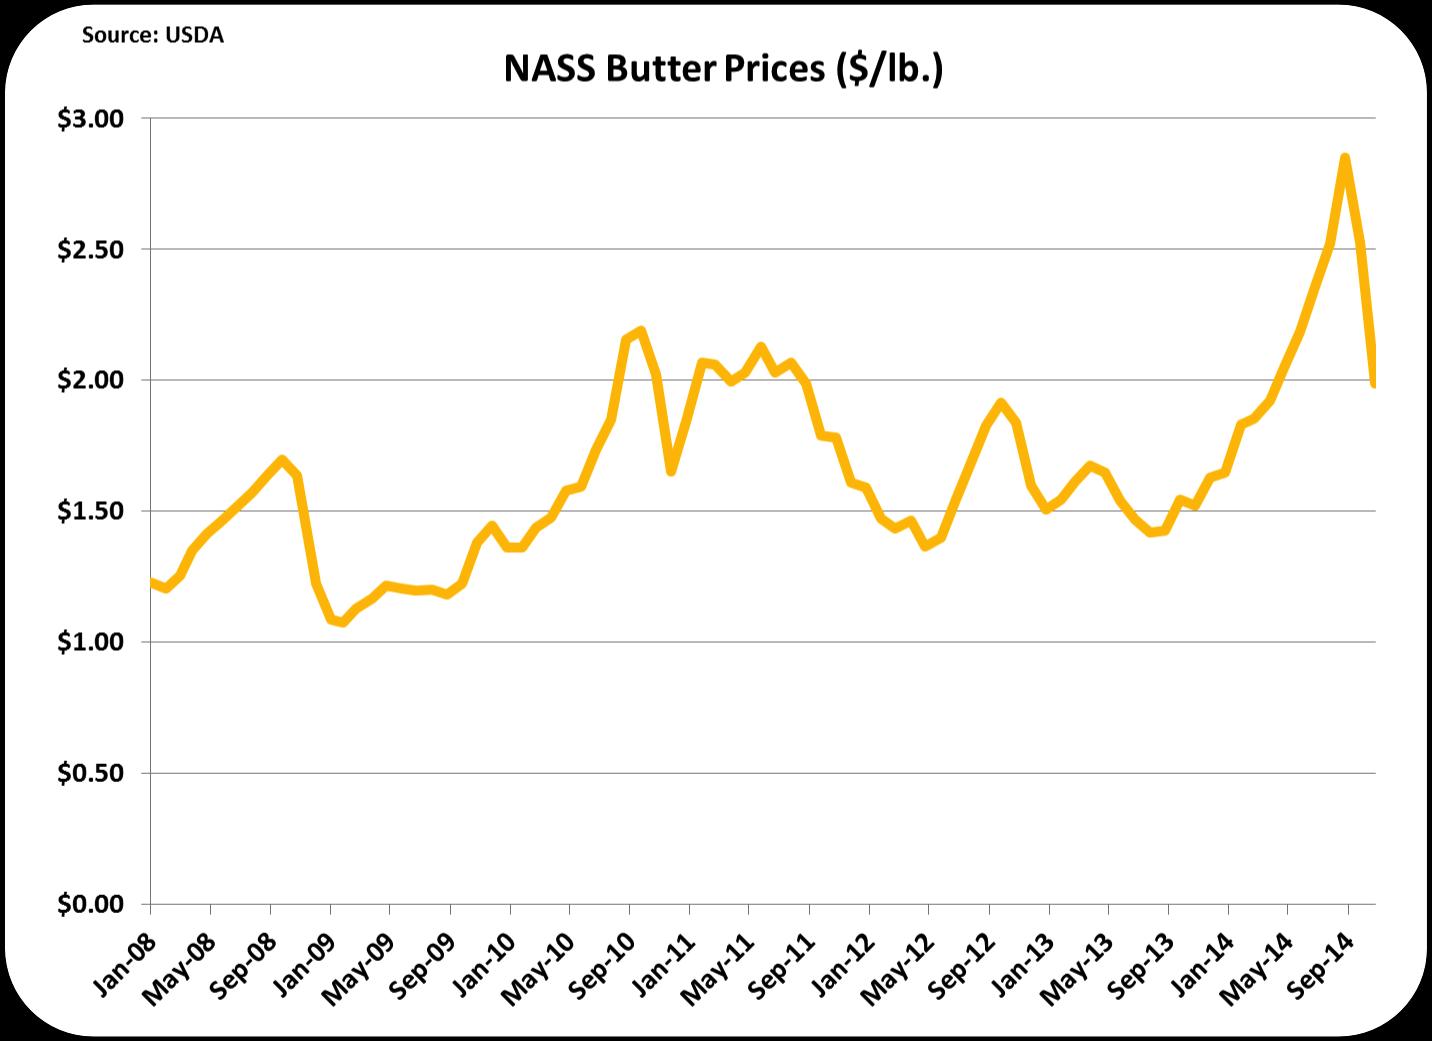 MilkPrice: Dairy Commodity Prices Fall